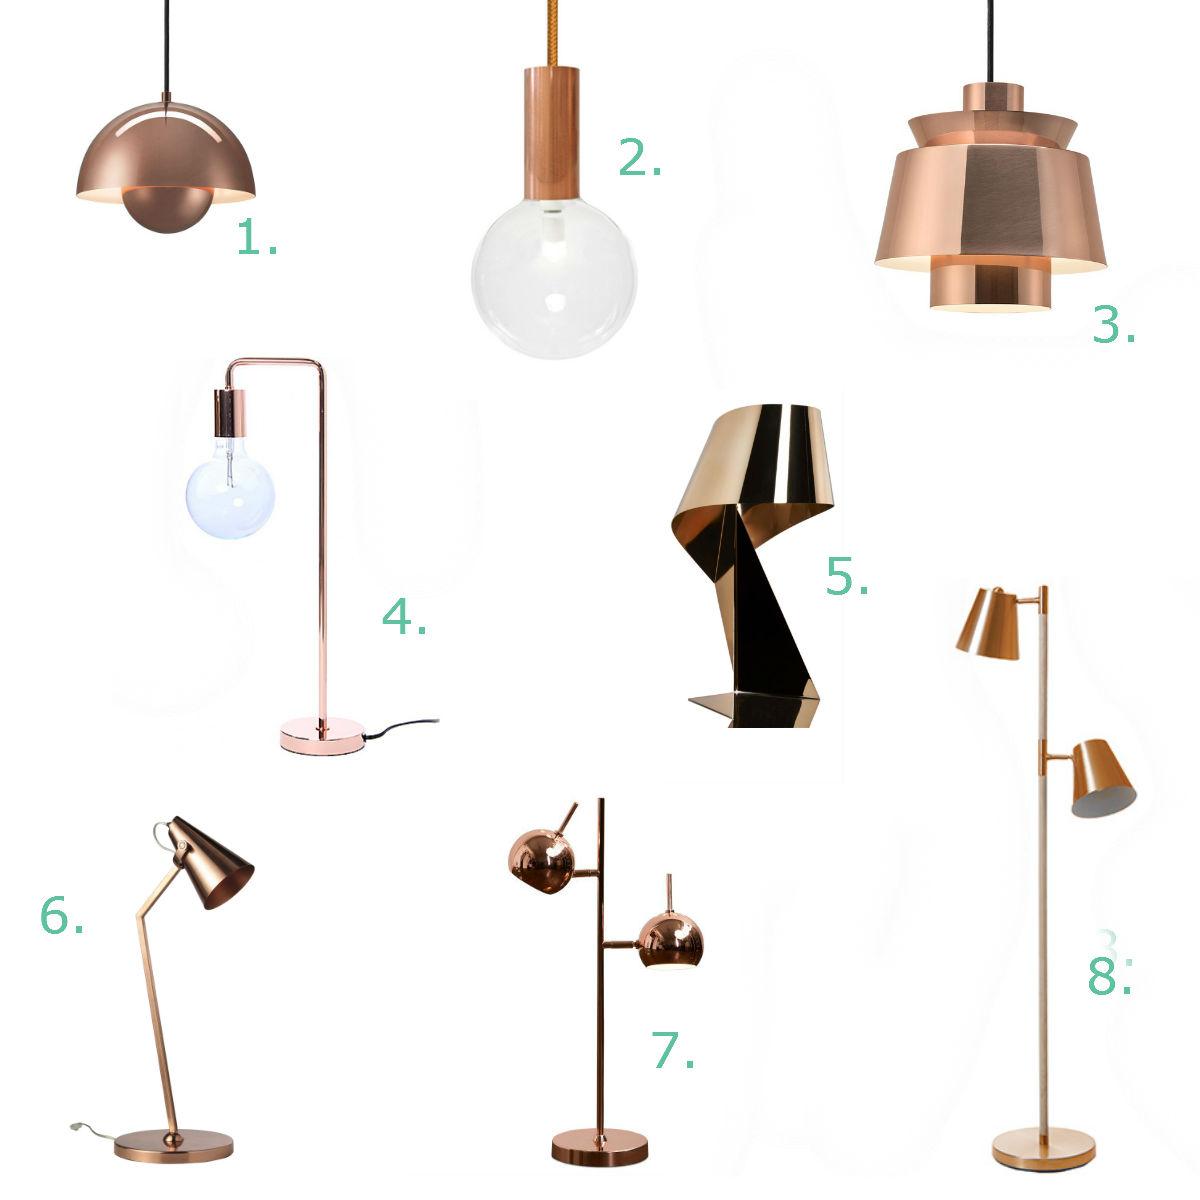 luminaire cuivre interesting luminaire suspendu vintage cuivre avec chane mm e with luminaire. Black Bedroom Furniture Sets. Home Design Ideas